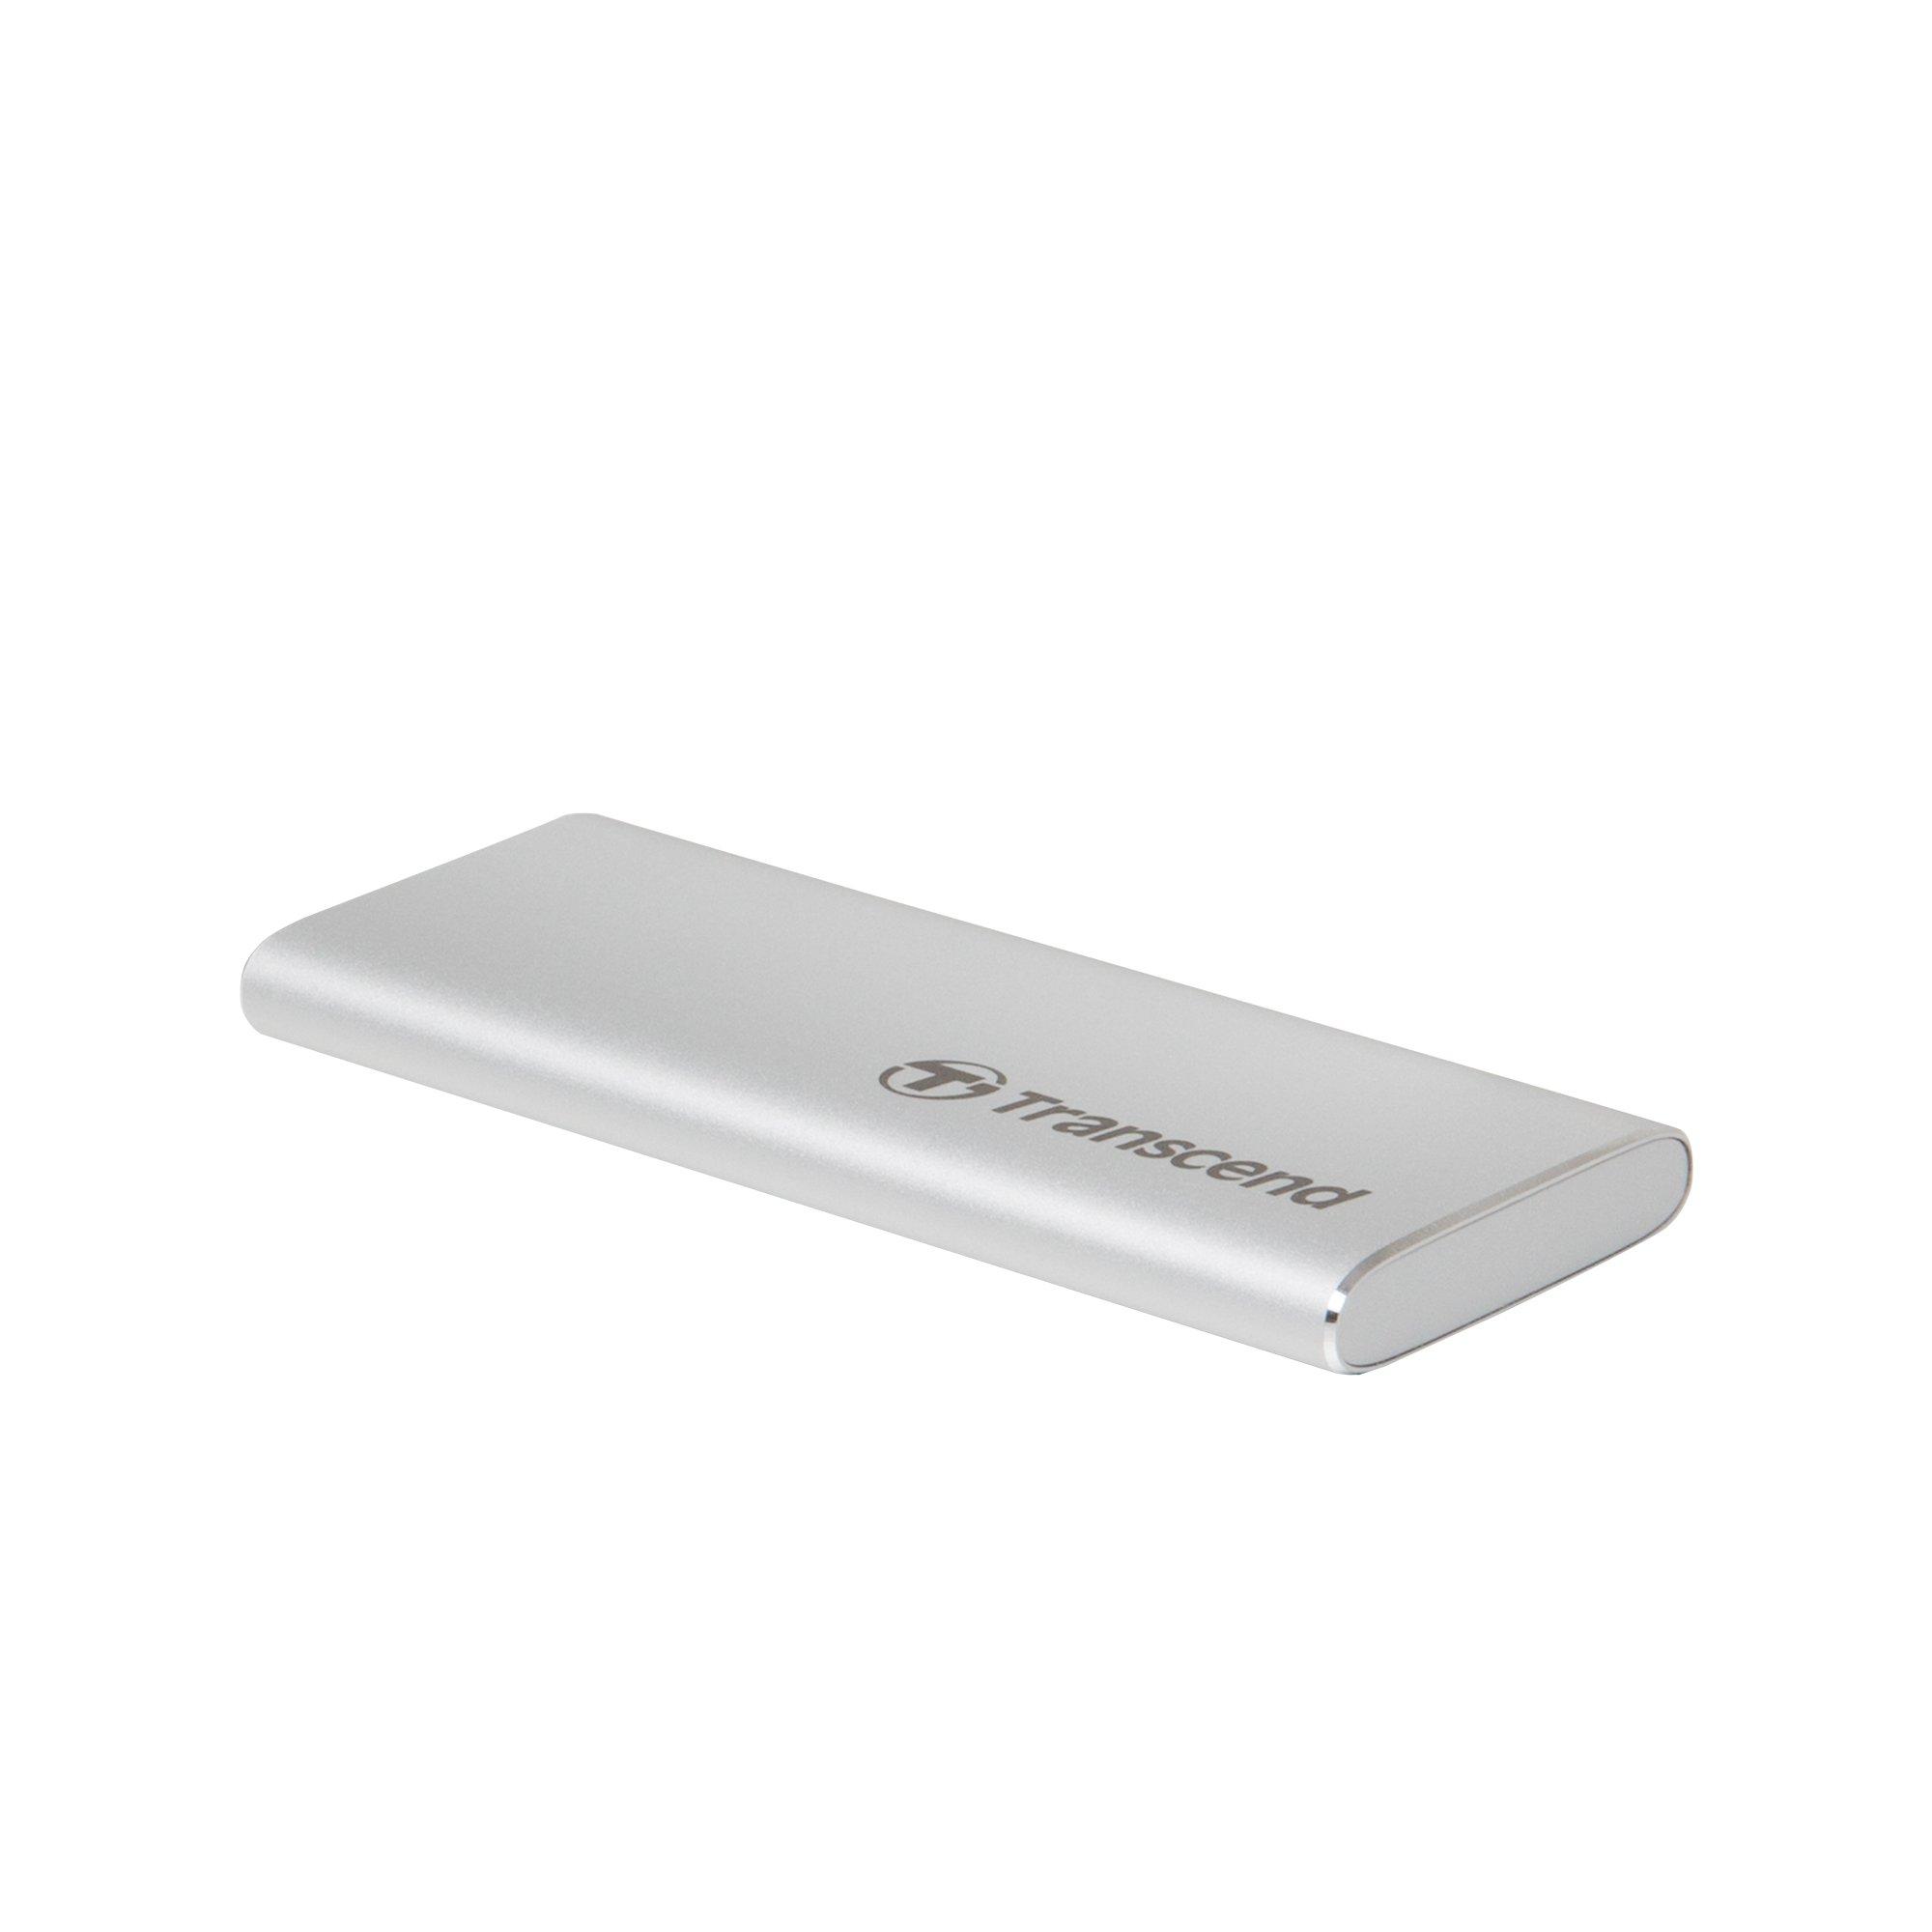 Transcend Information 240GB Portable SSD TLC USD 3.1 Gen 2, Silver (TS240GESD240C) by Transcend (Image #2)